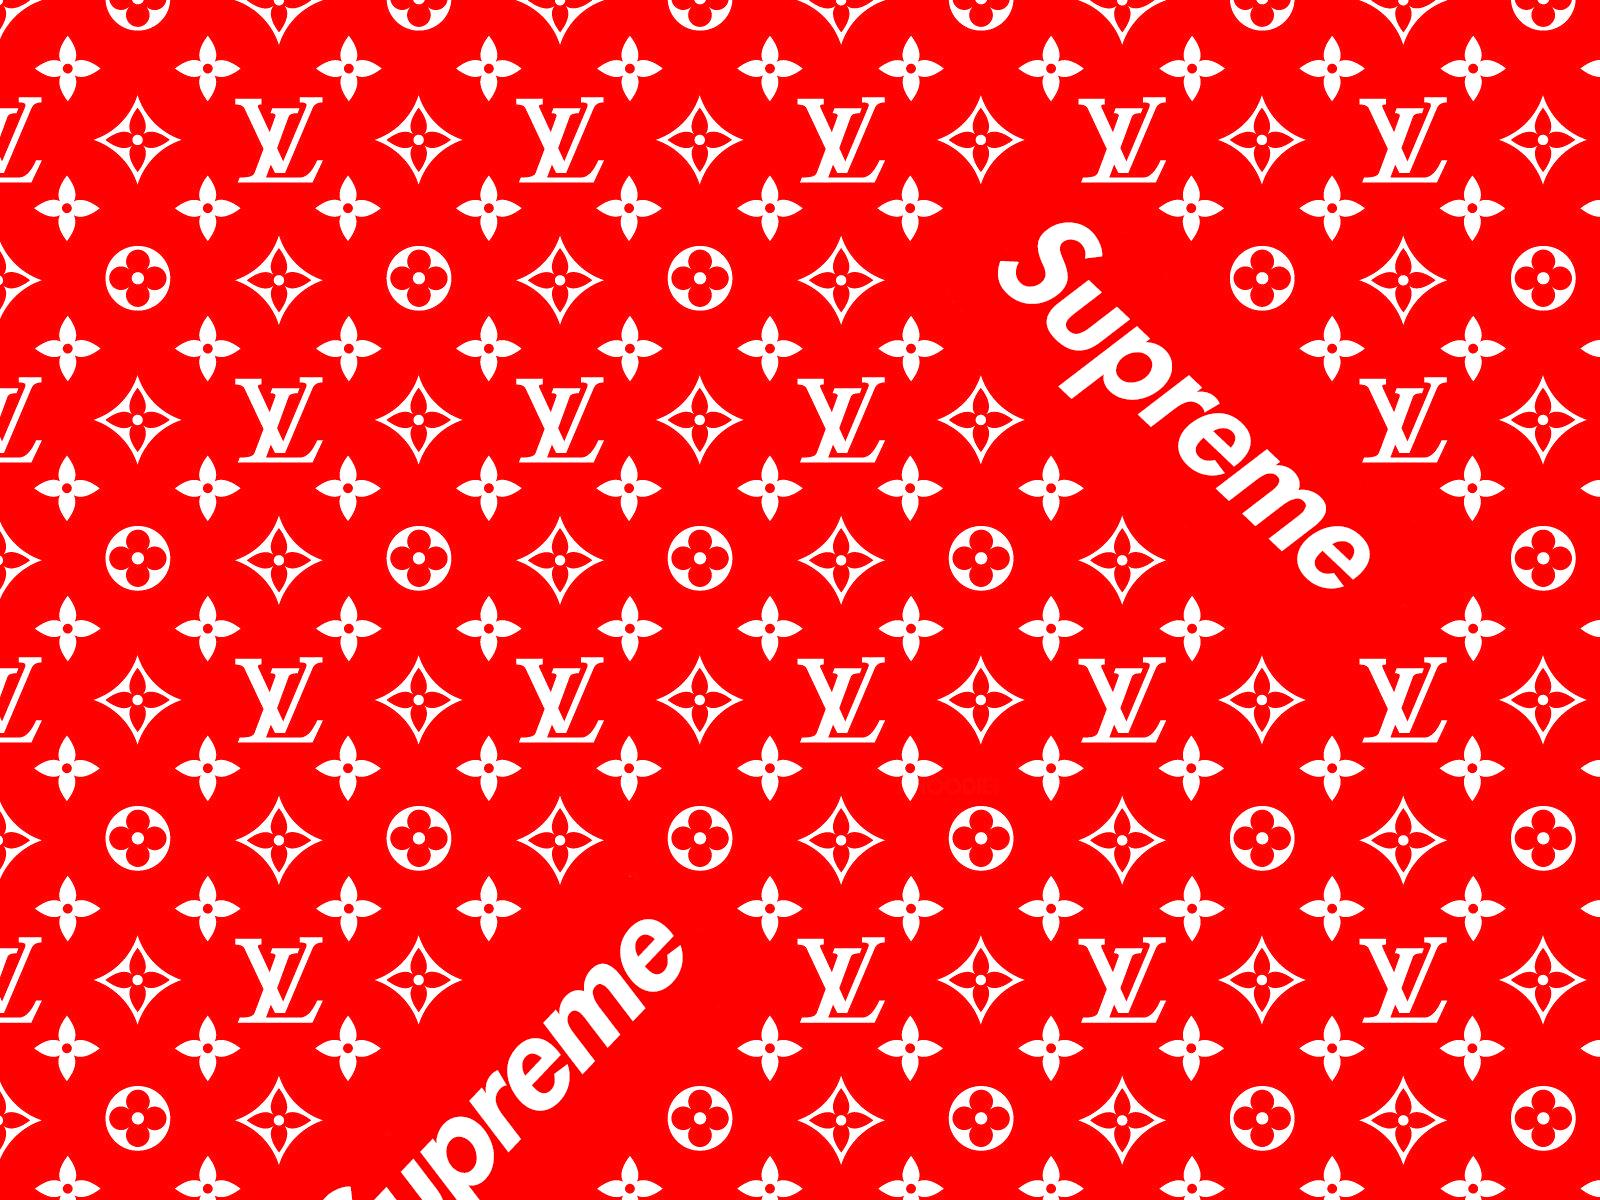 ahoodie supreme classic box logo wallpaper 3d wallpapers